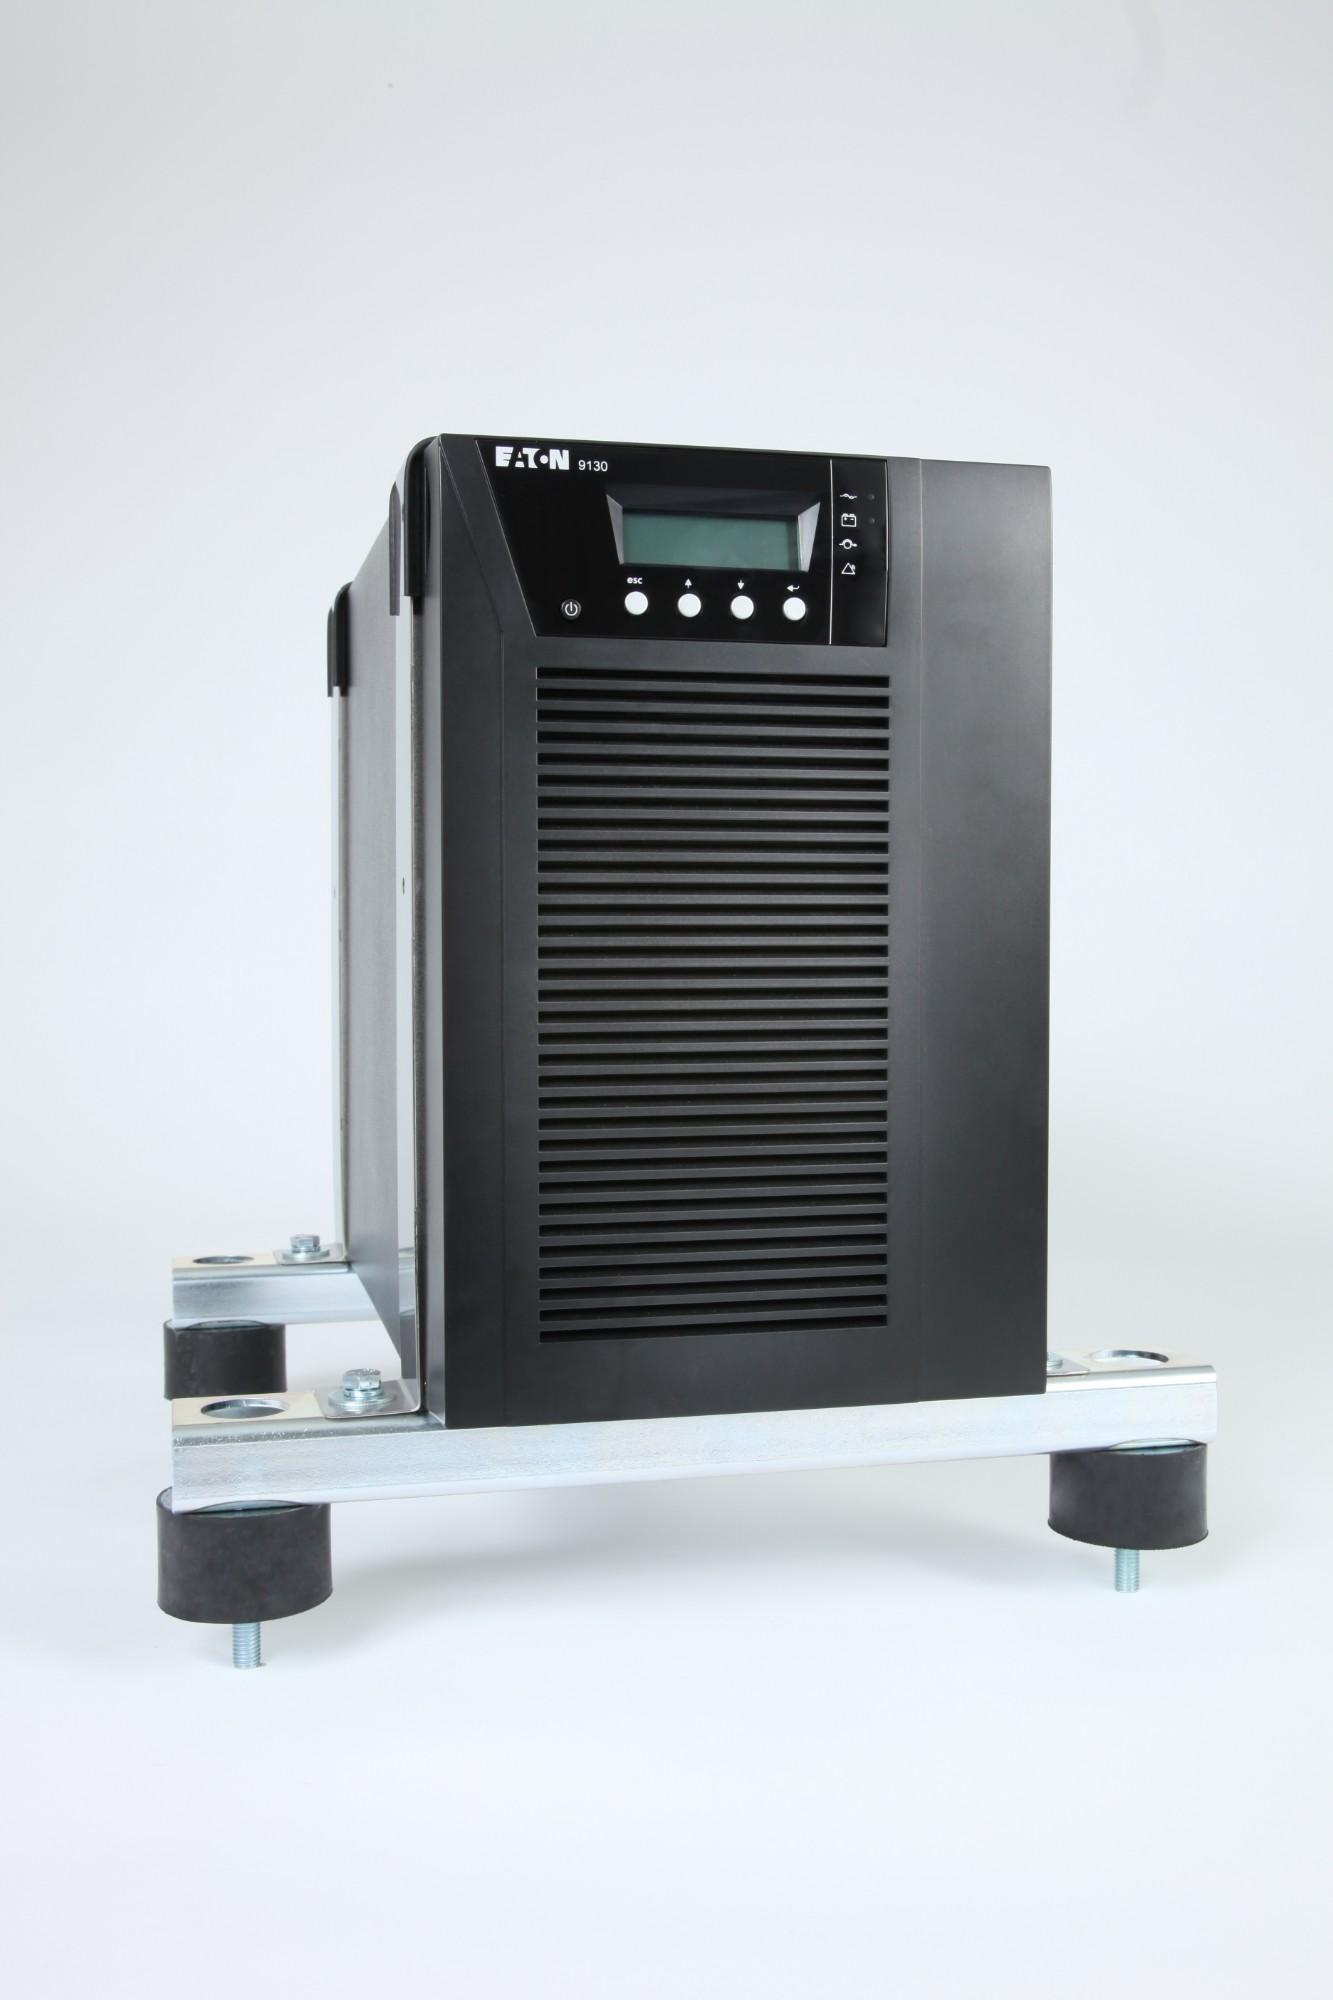 Eaton 9130 Marine 1000VA 1000VA 6AC outlet(s) Tower Black uninterruptible power supply (UPS)